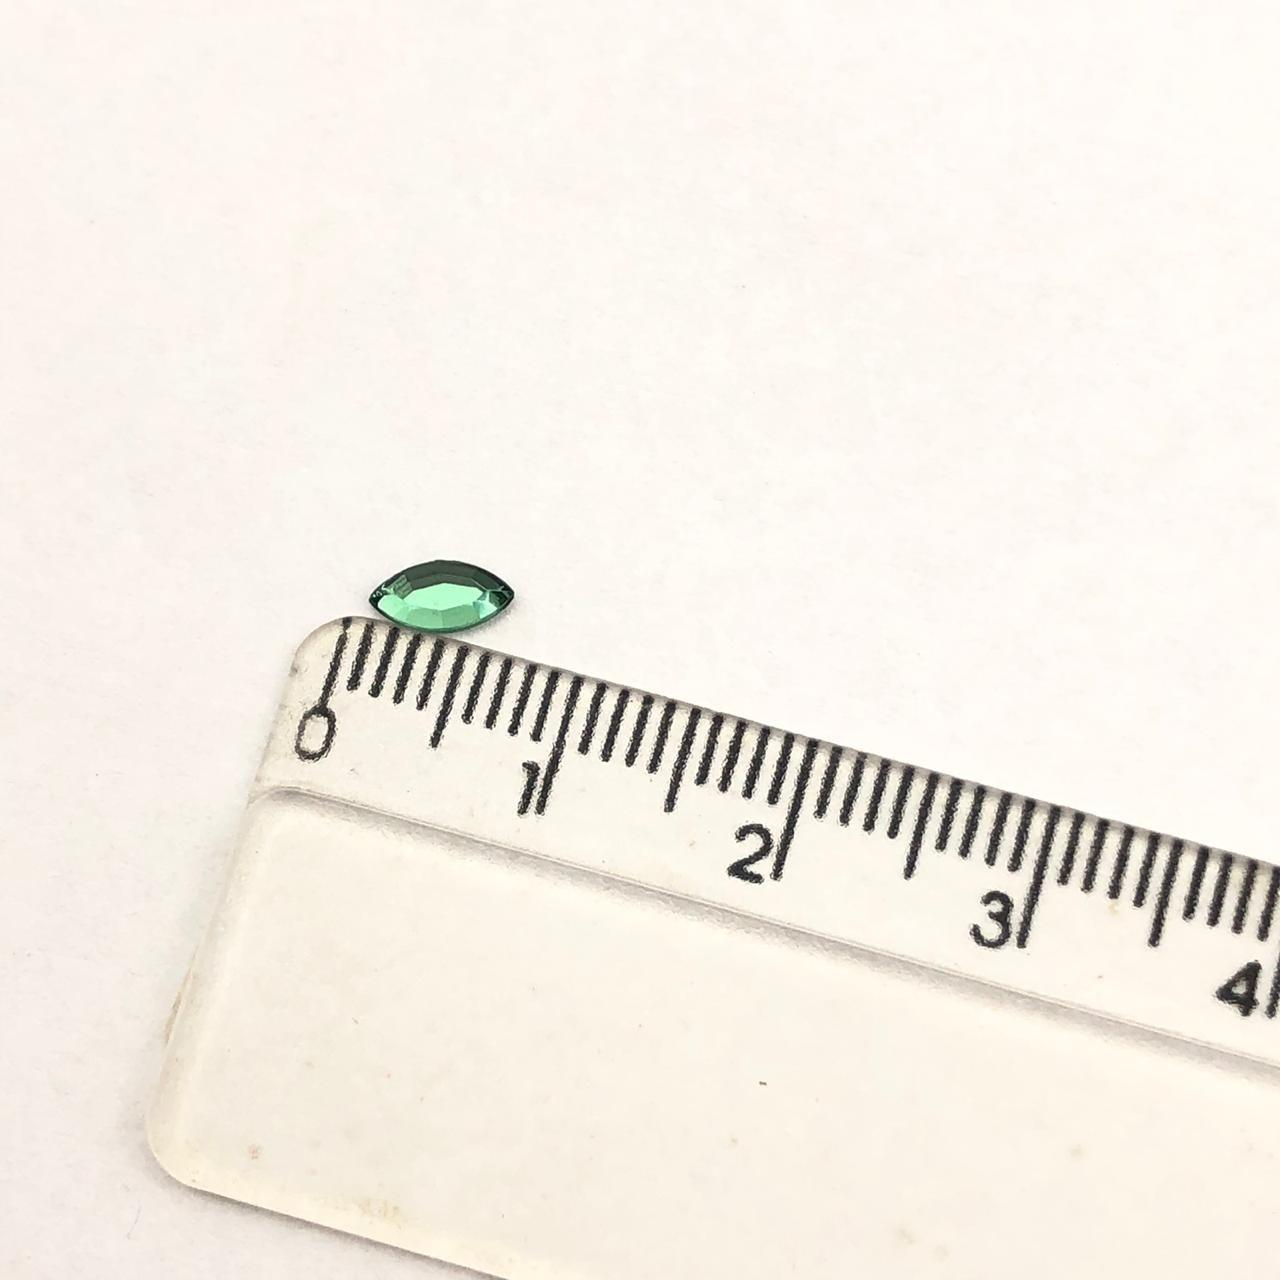 CHT1455 - Chaton Navete Green Turmaline 3x6 - 20unids